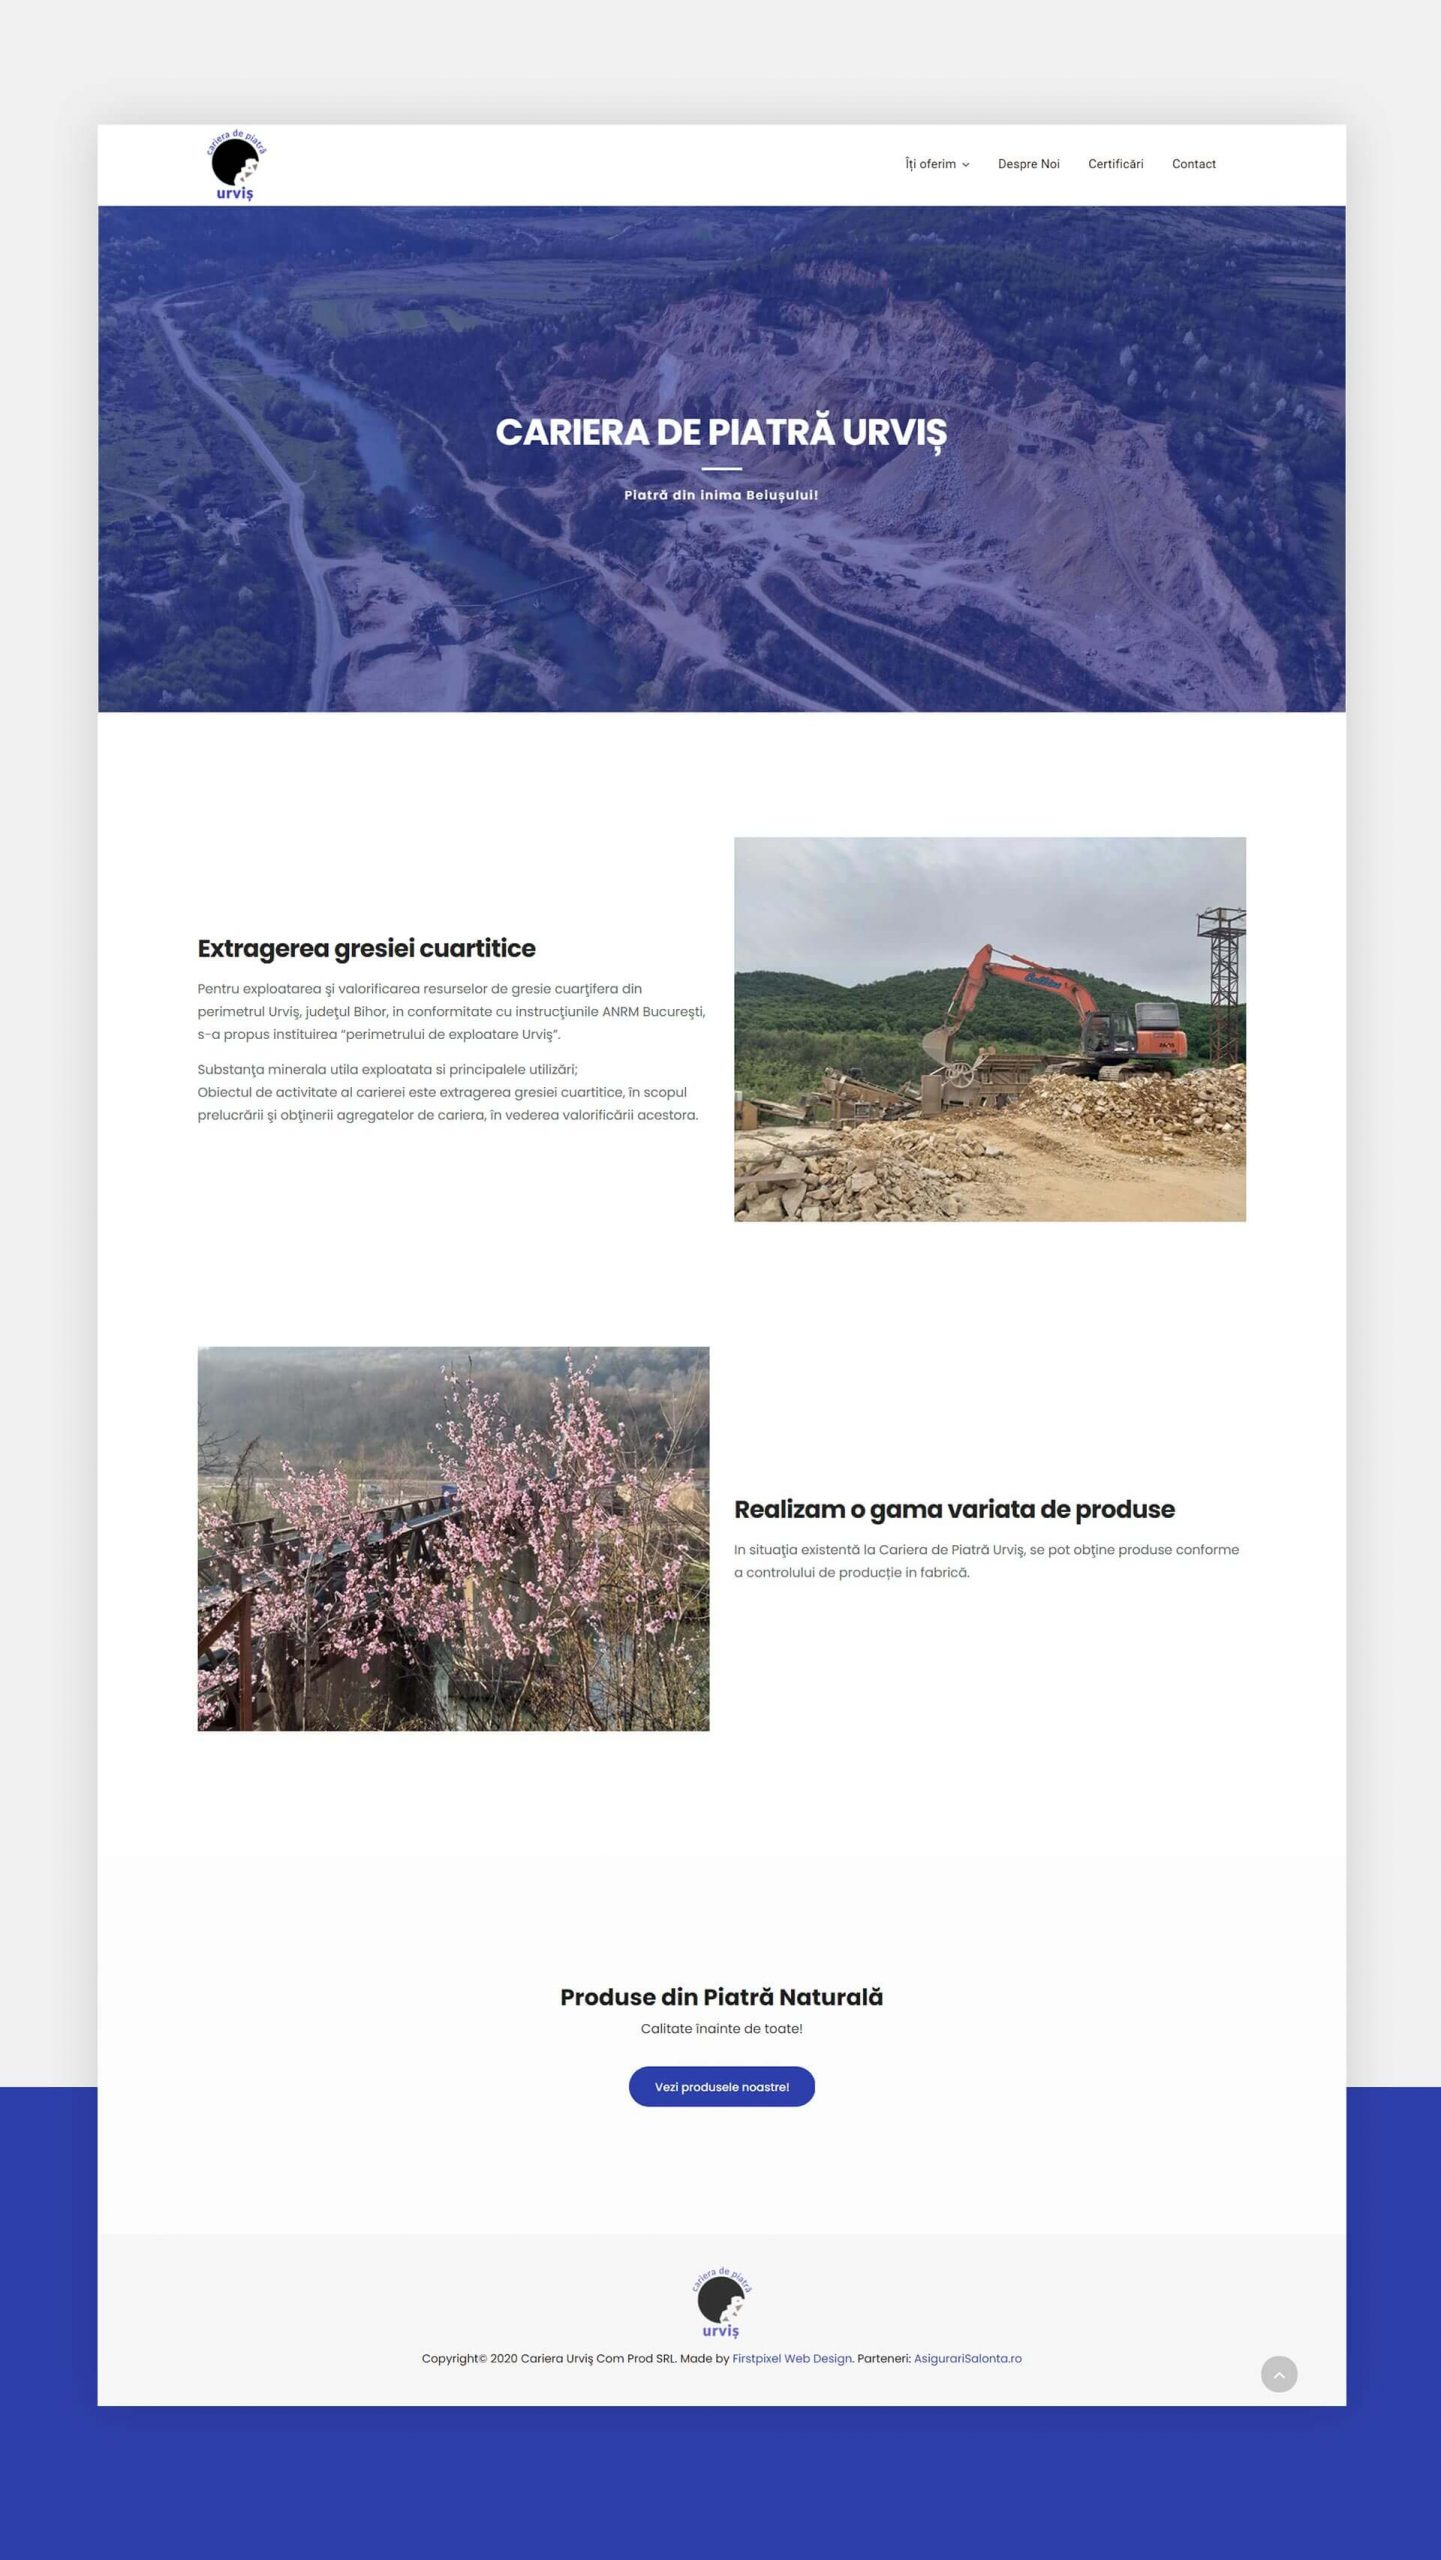 prezentare-site-full-cariera-de-piatra-urvis